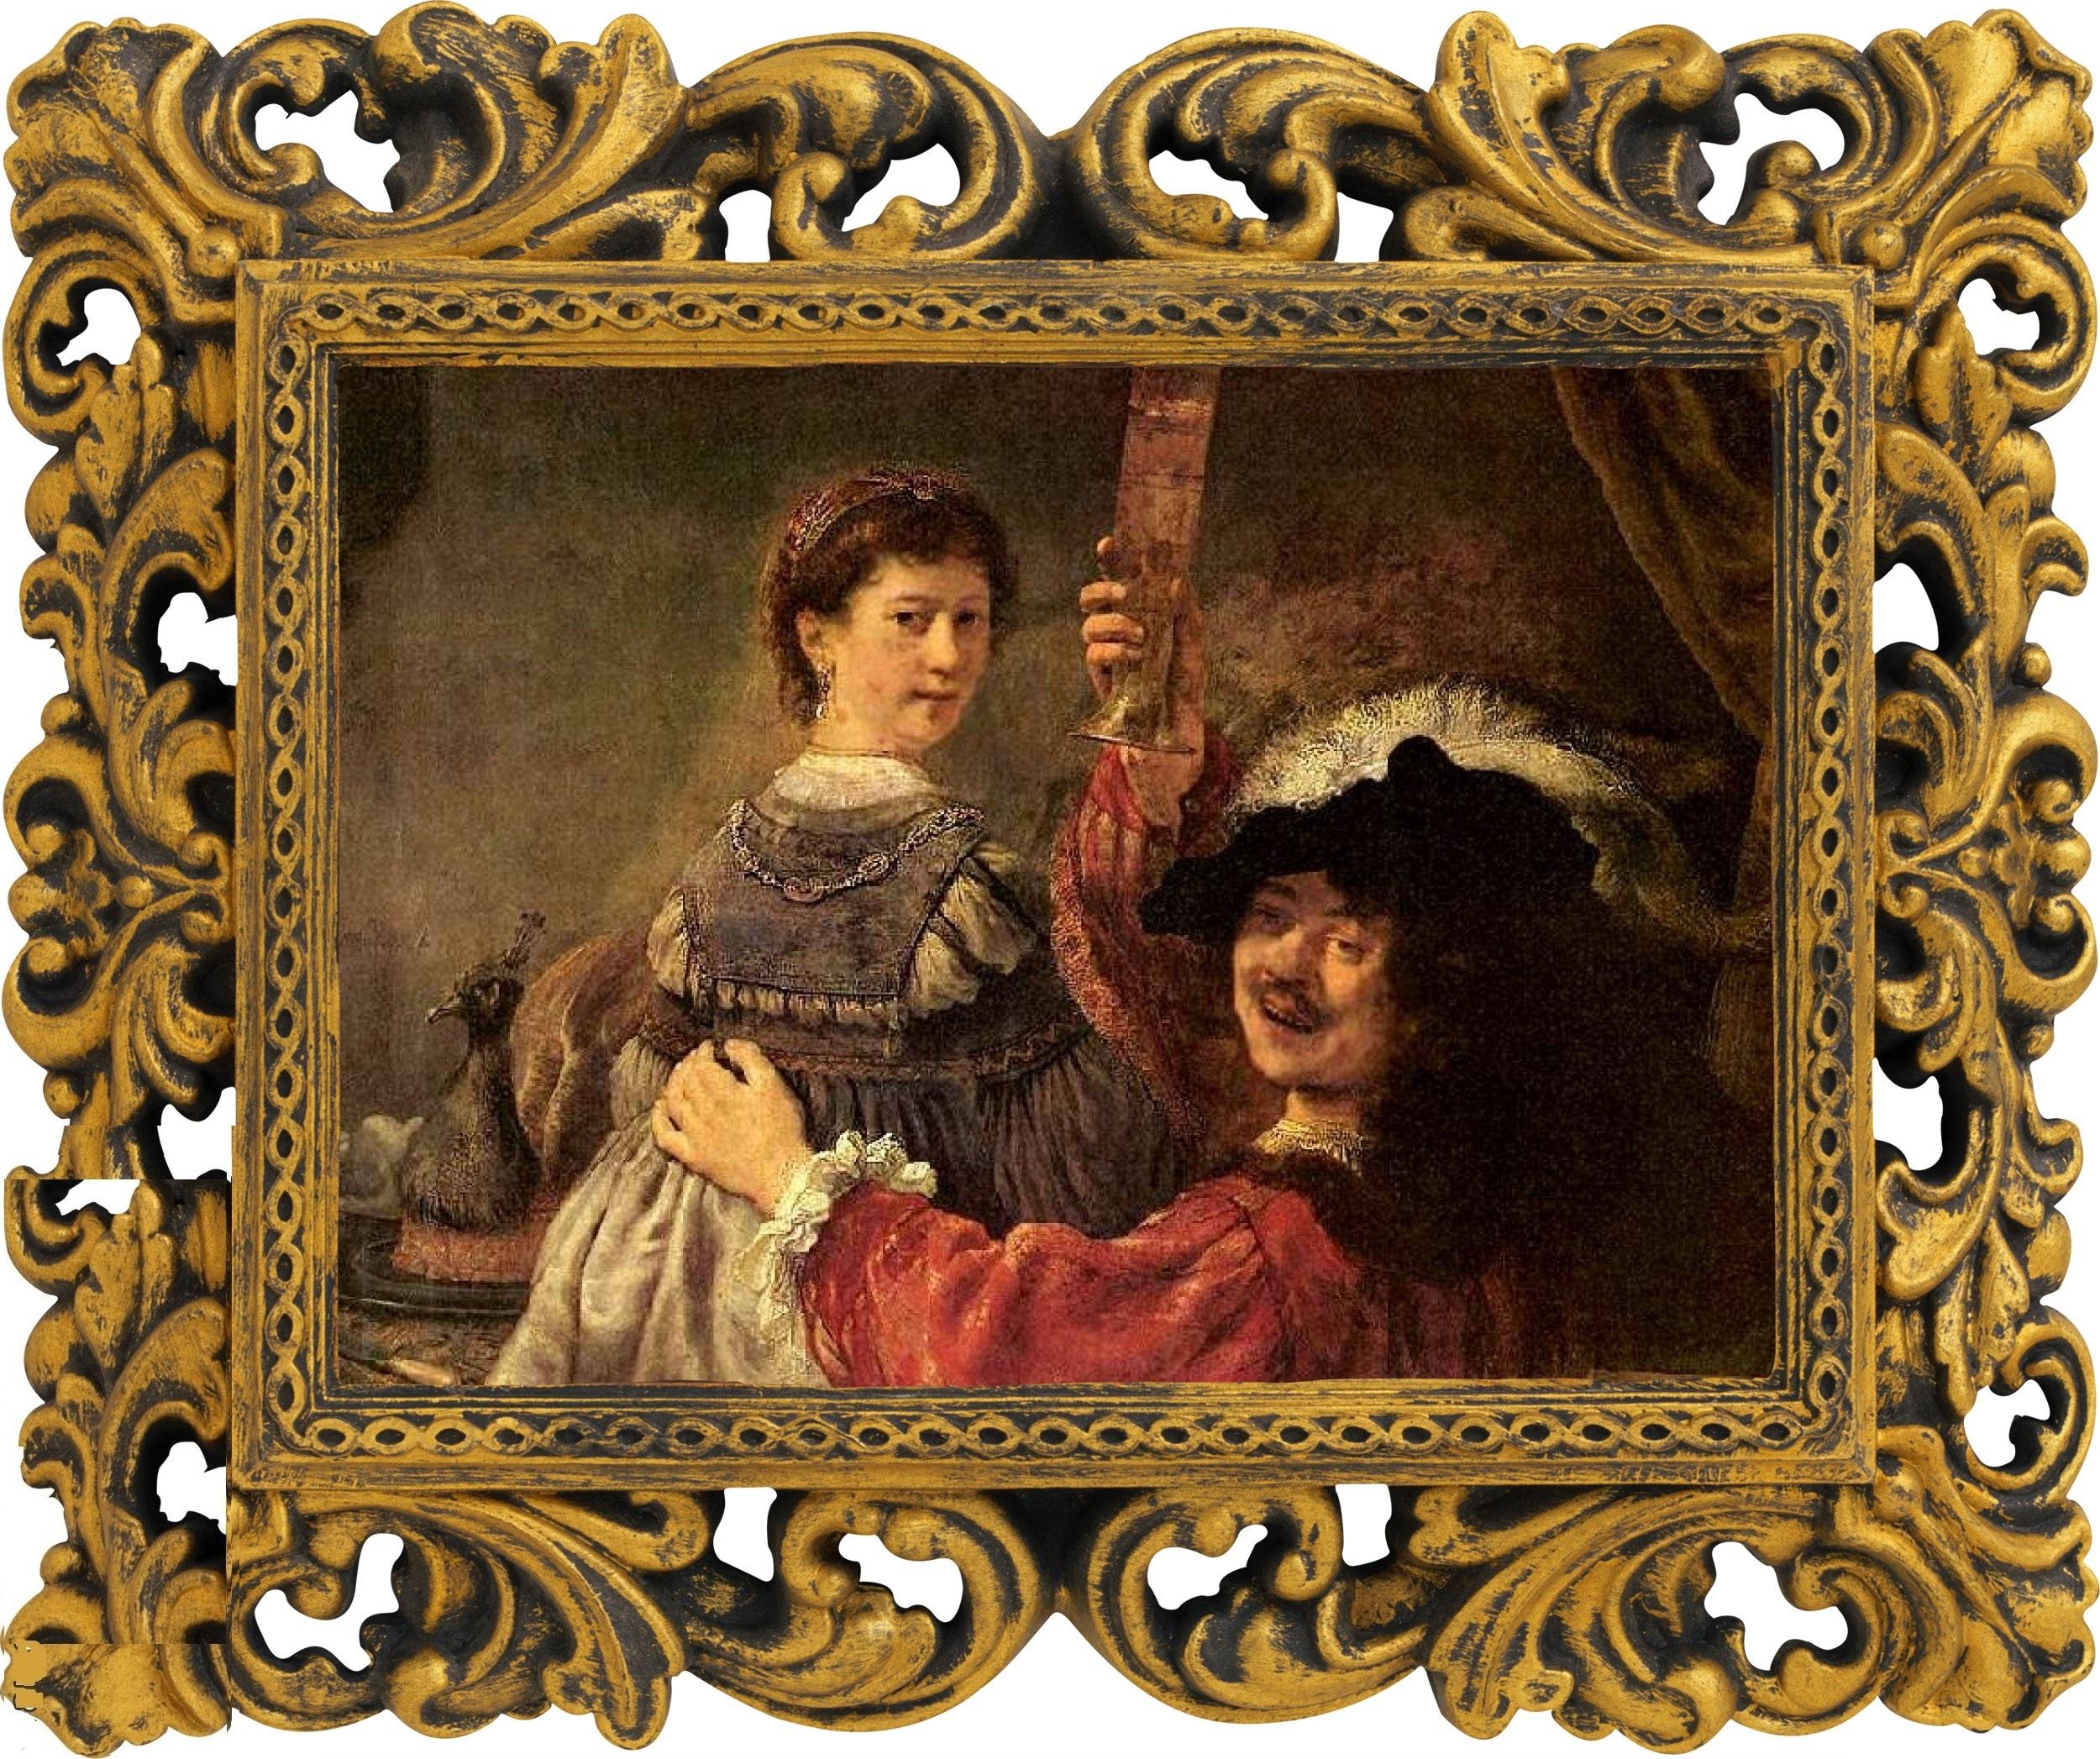 Автопортрет с Саскией на коленях, Рембрандт Харменс ван Рейн